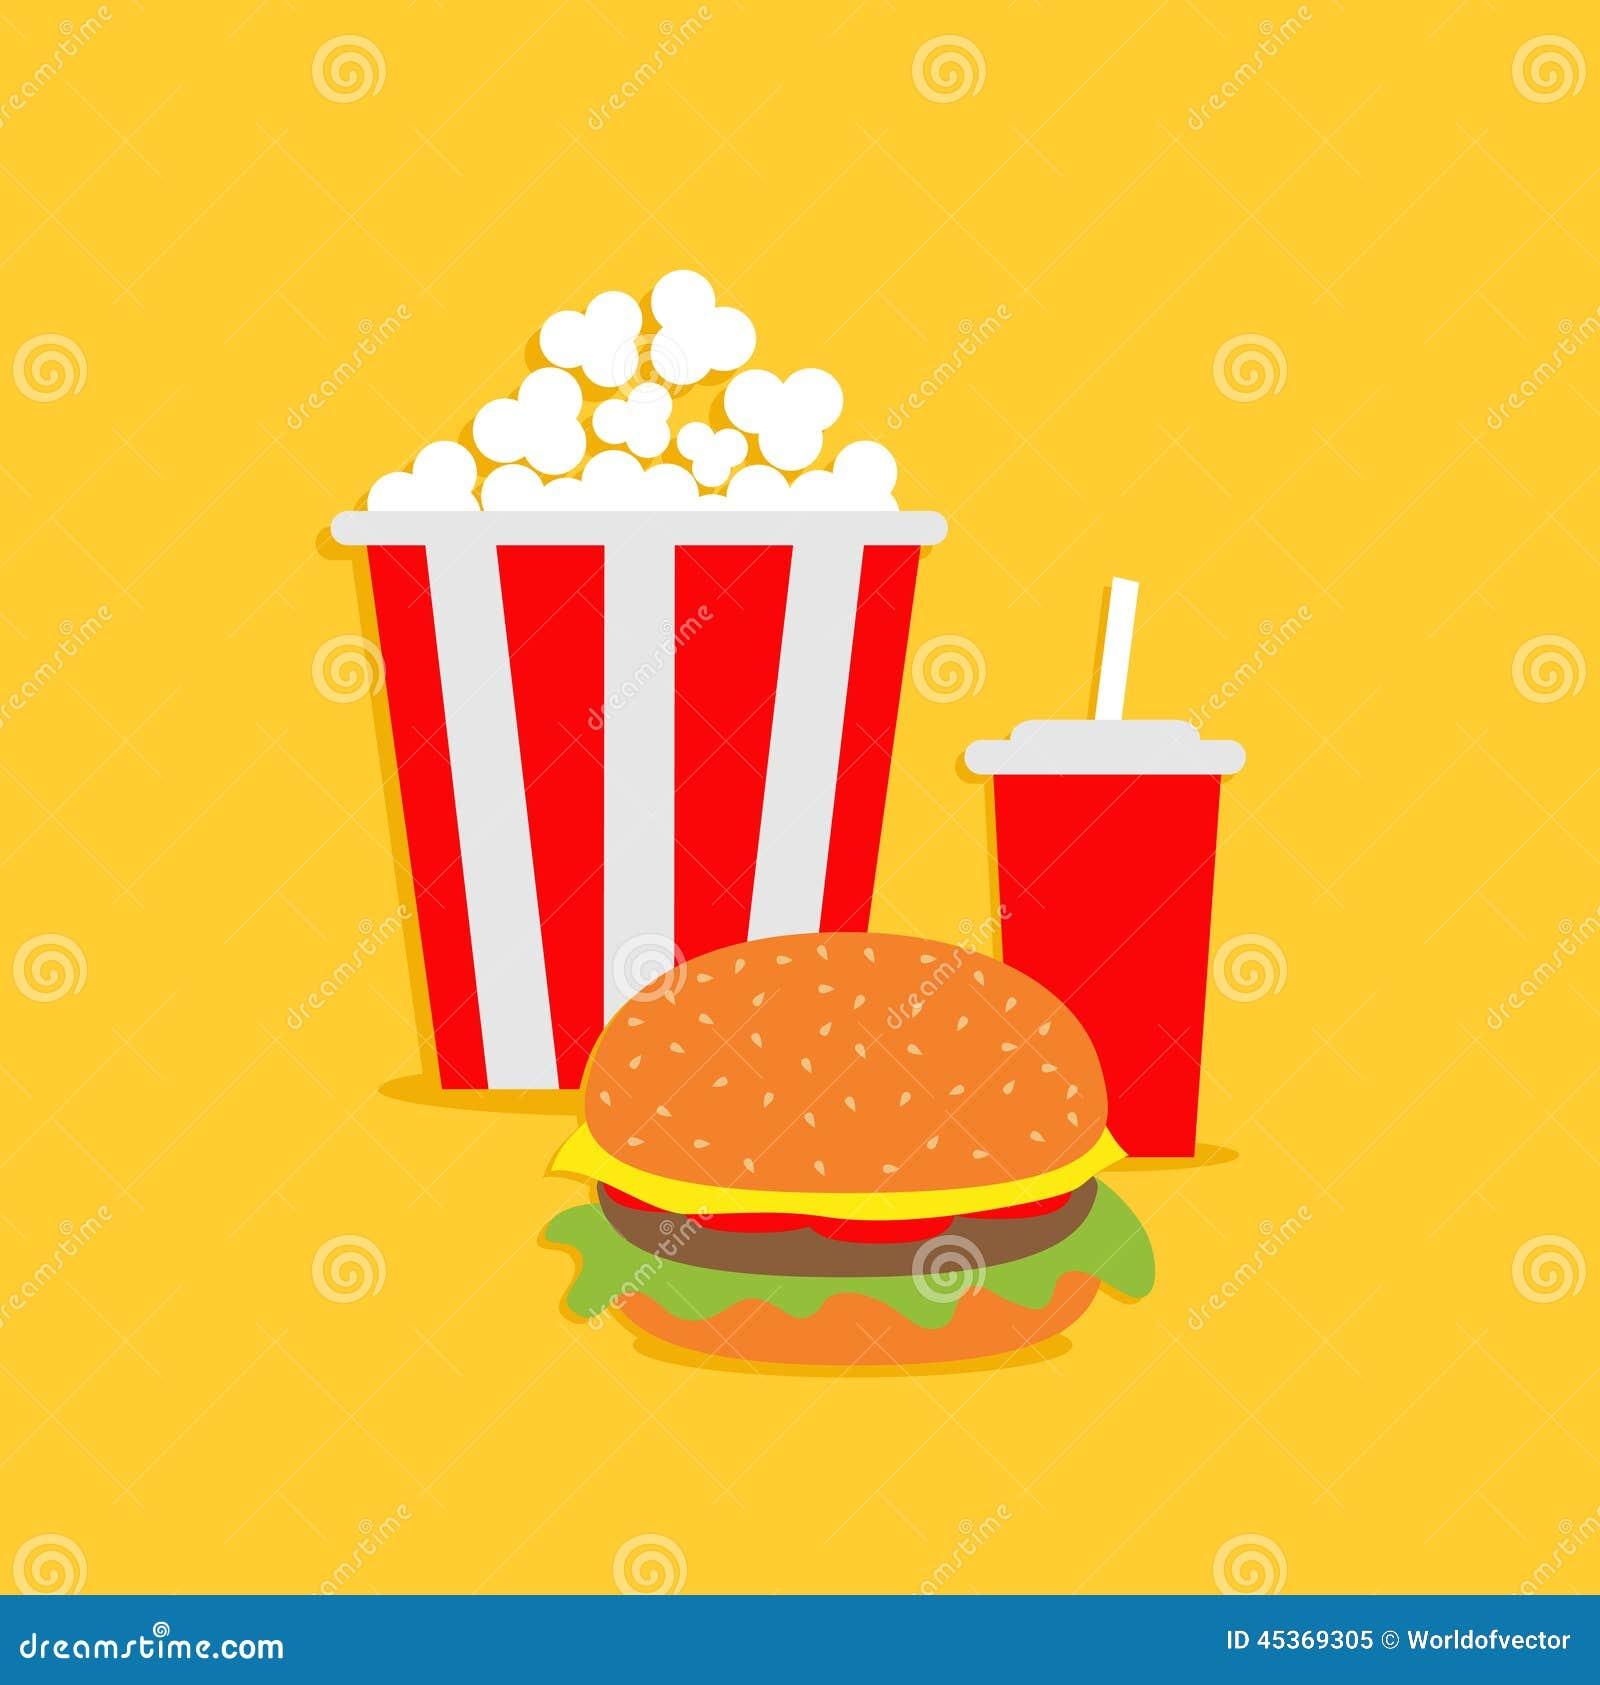 Popcorn, Hamburger, Soda With Straw. Cinema Icon In Flat ...